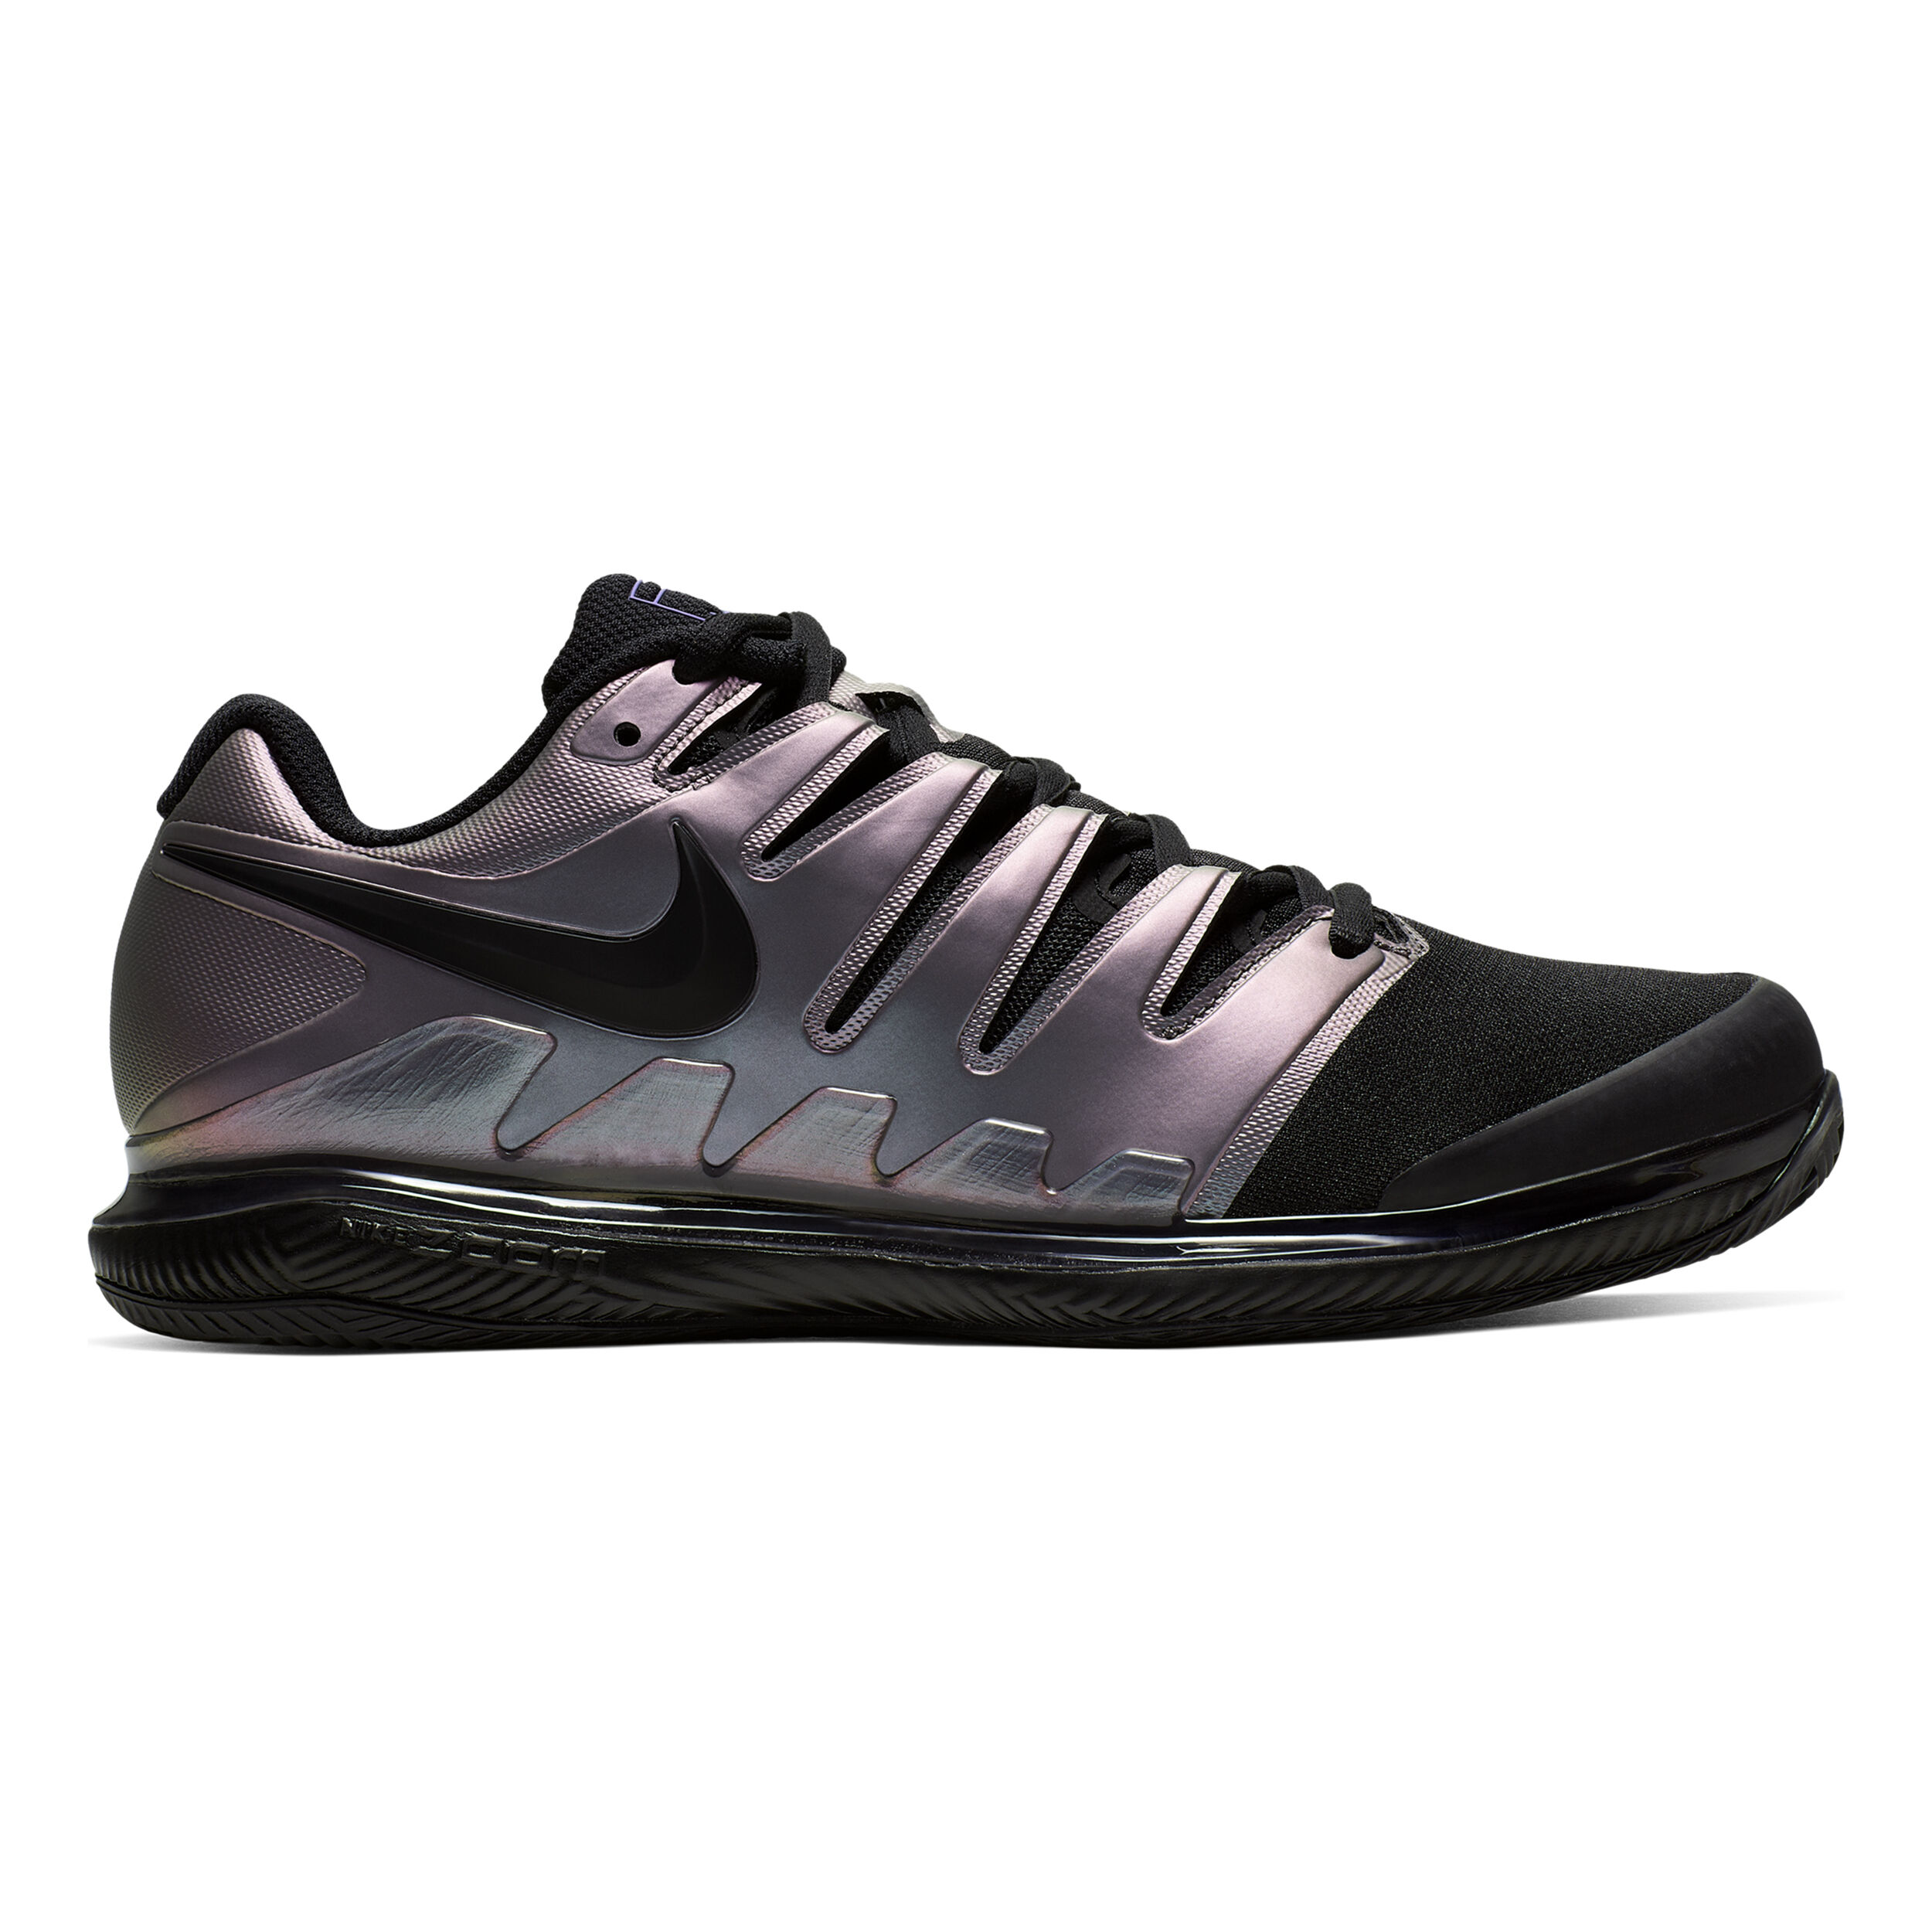 Triathlete така Направи усилие chaussures nike air zoom vapor 10 ...